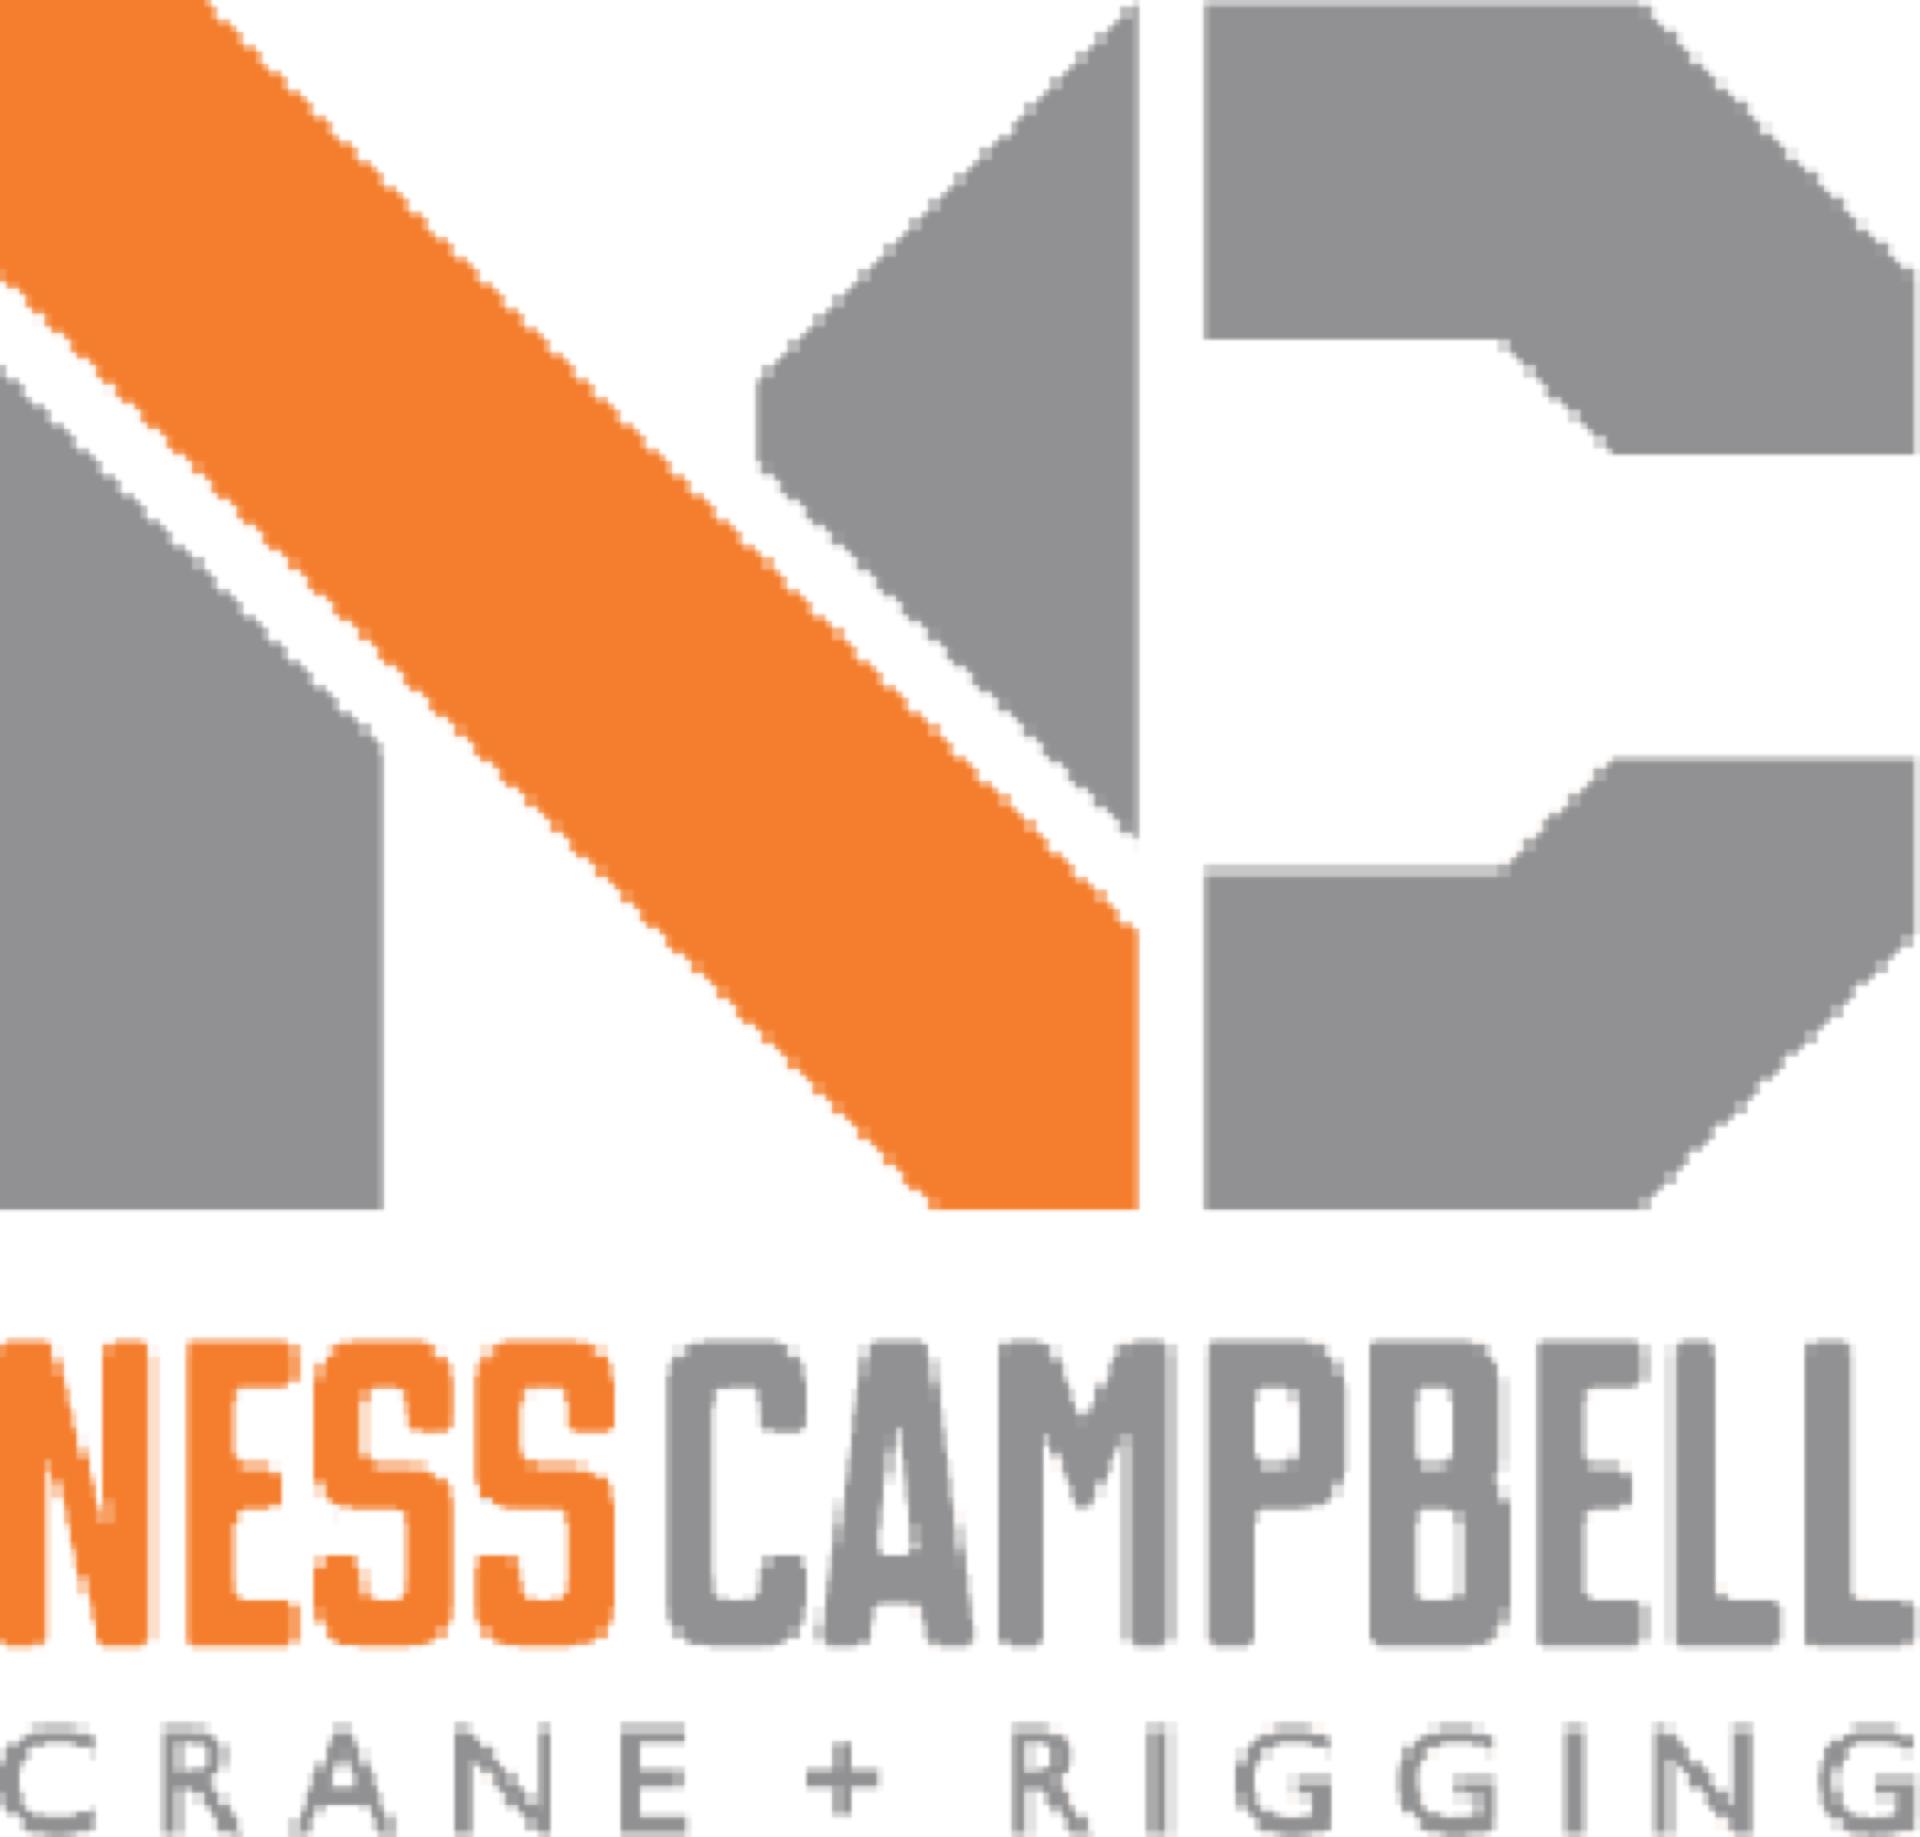 NessCampbell Crane + Rigging